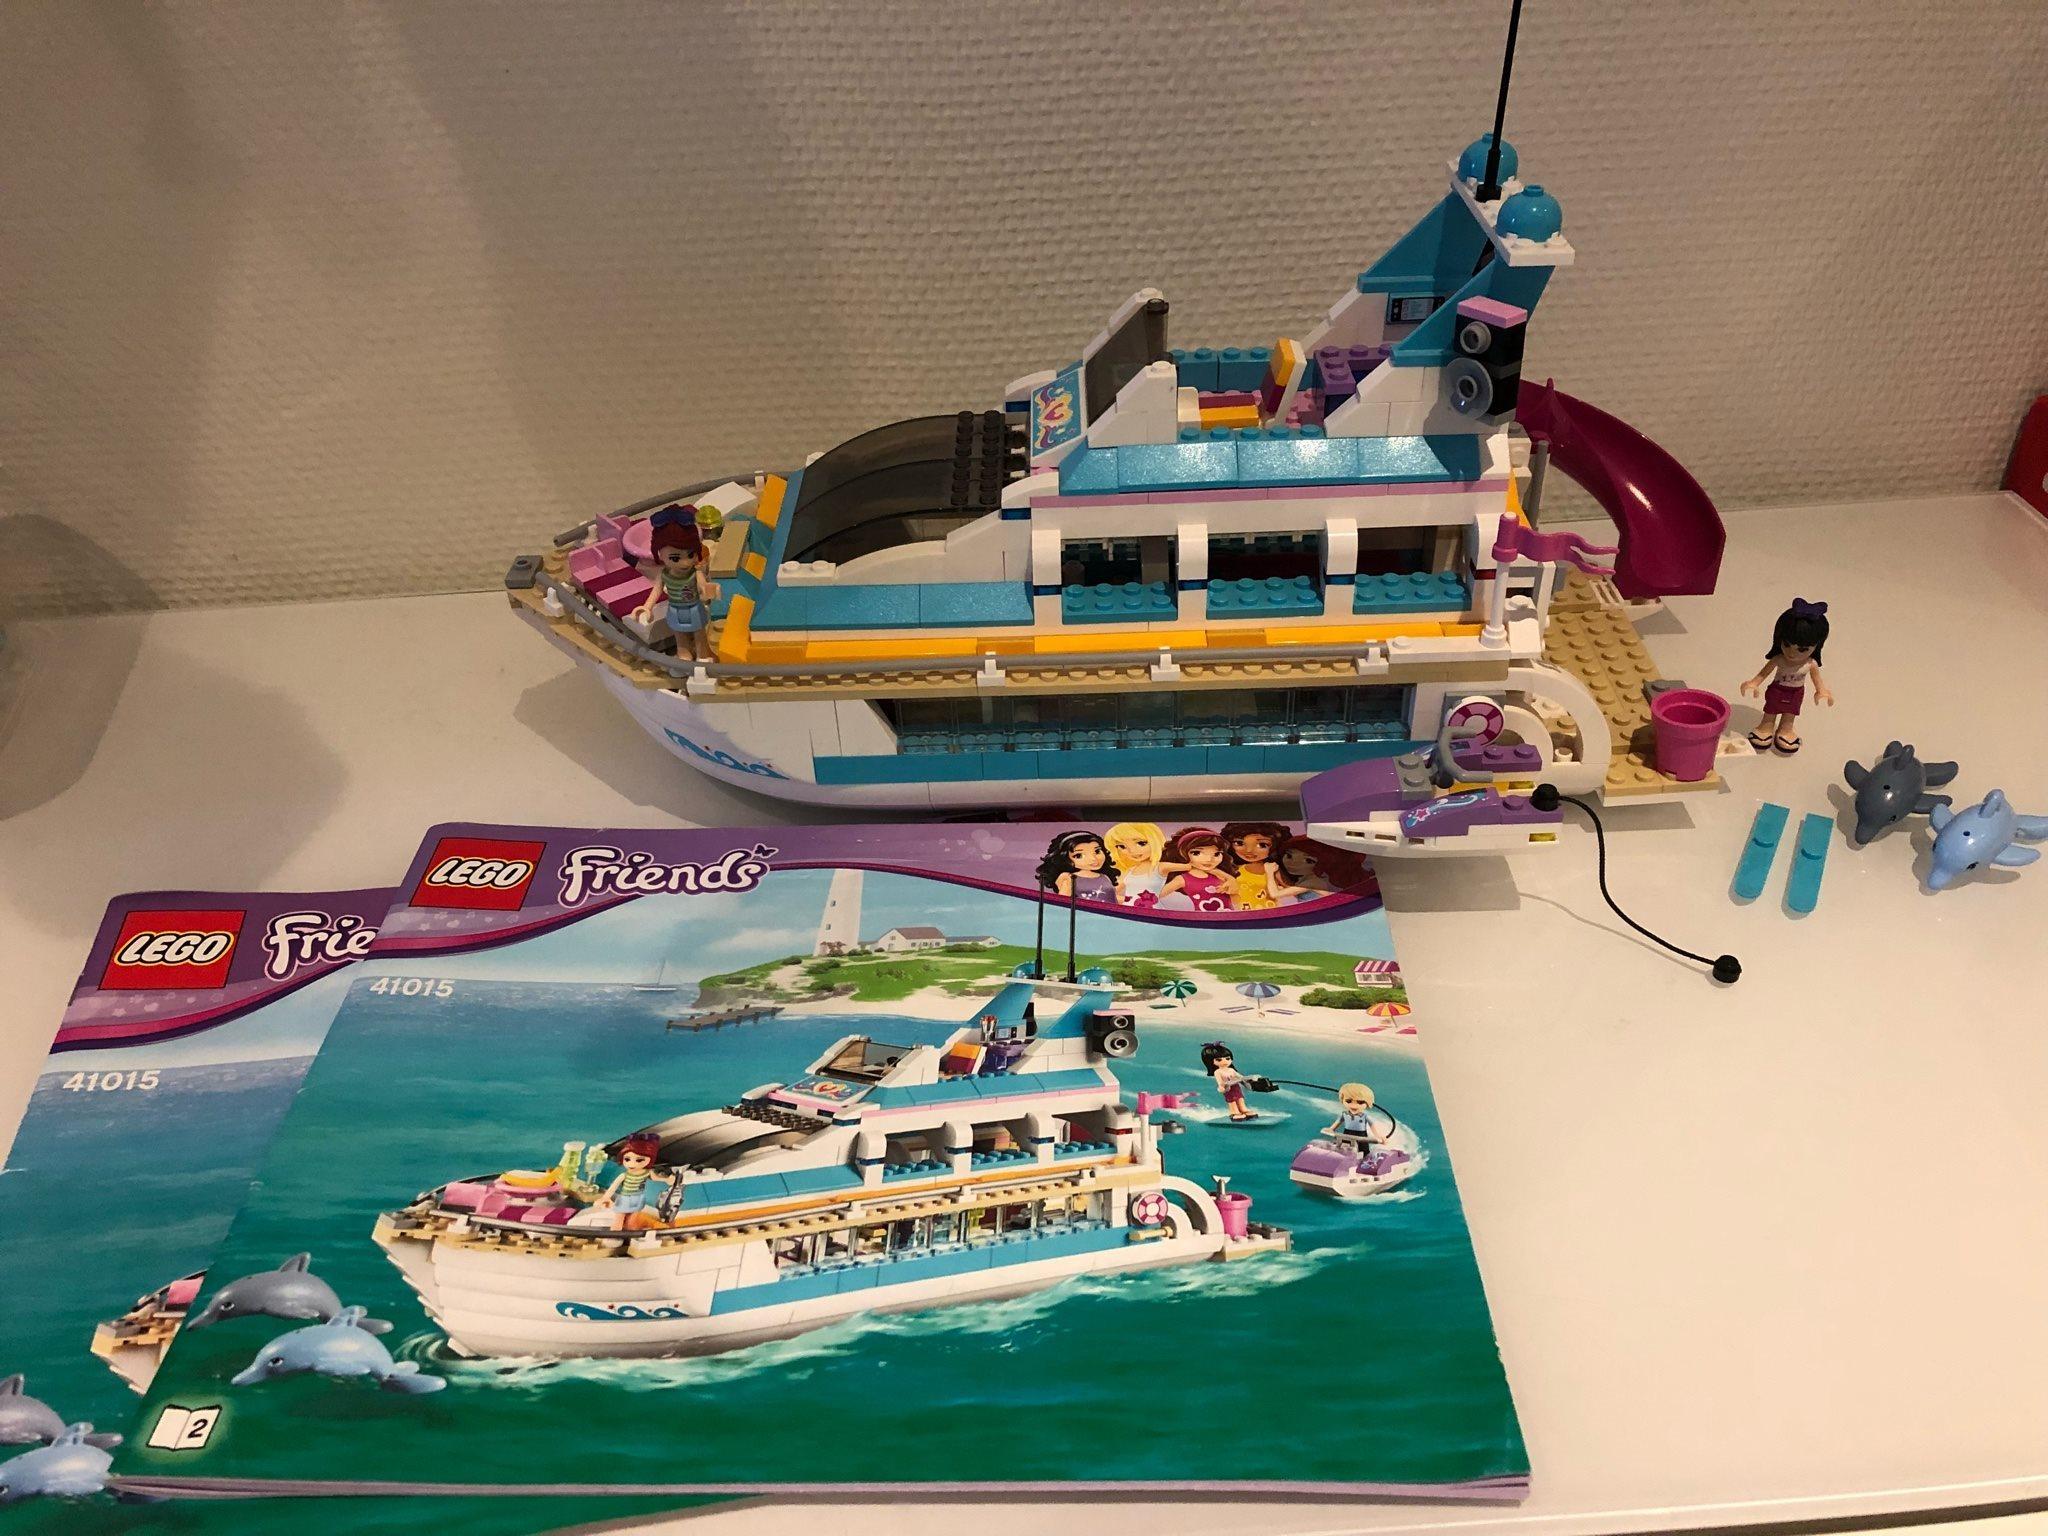 Groovy Lego Friends Kryssningsfartyg 41015 (båt) (328970159) ᐈ Köp på MR-96